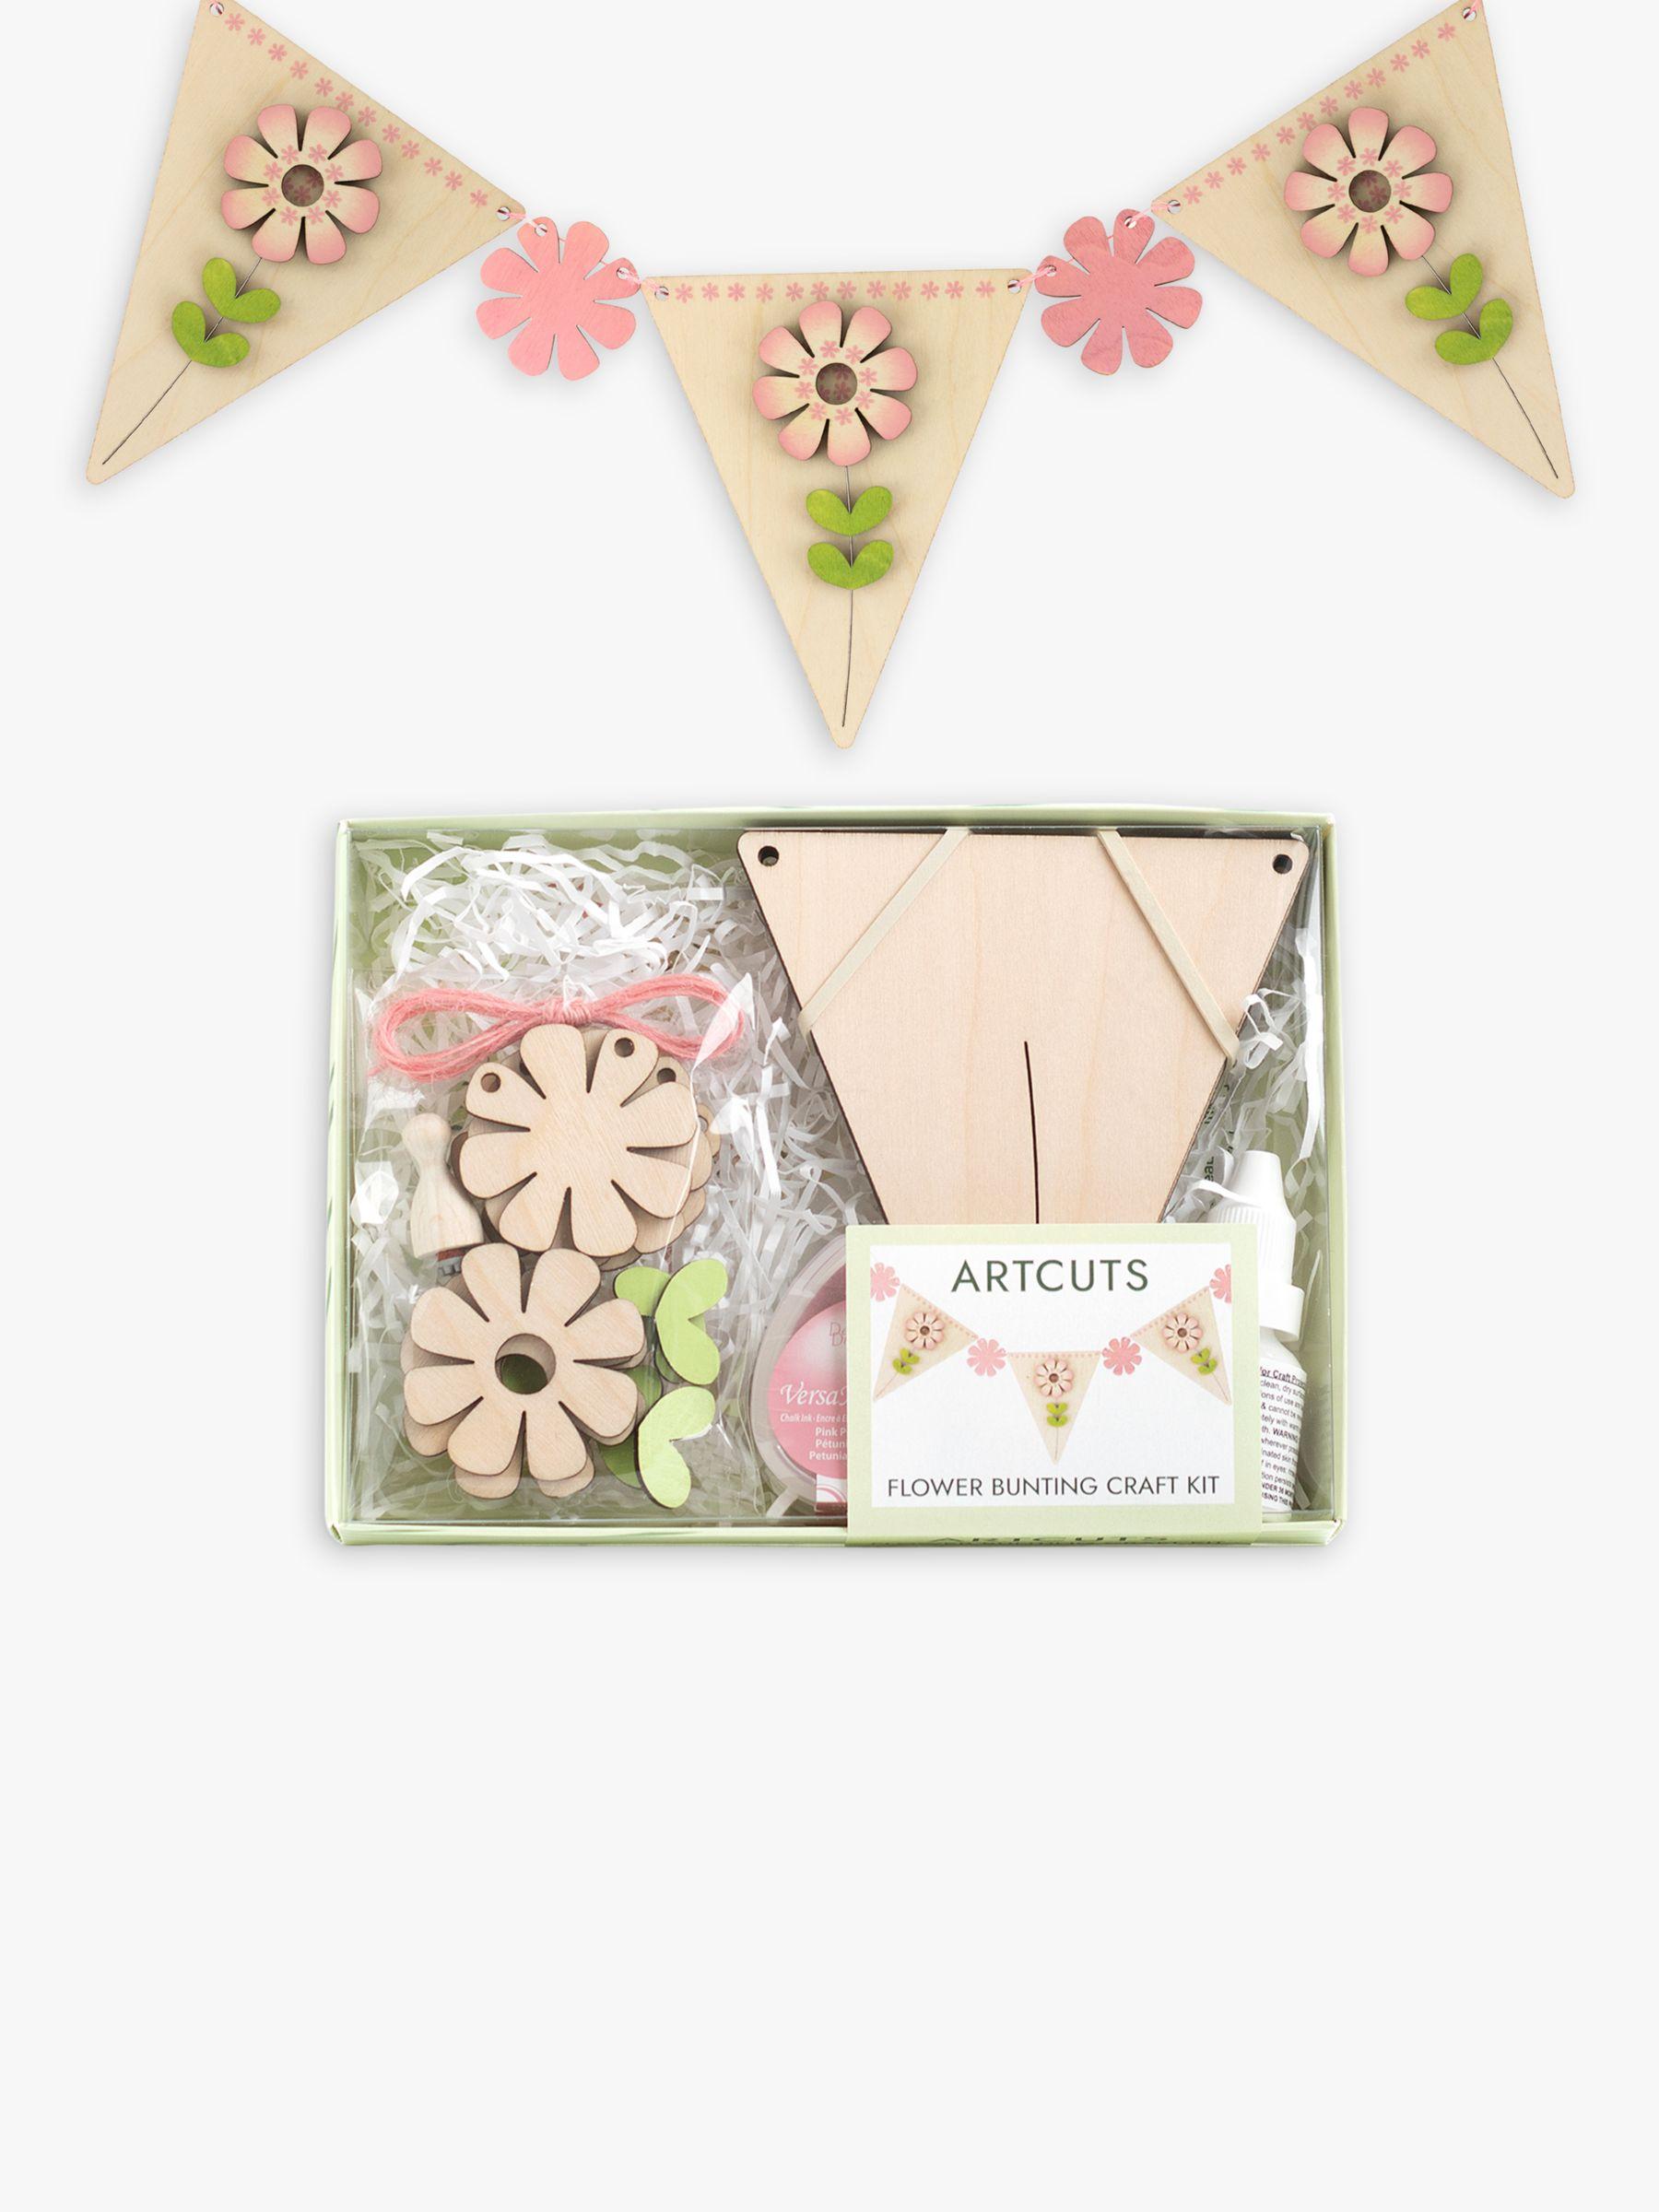 Artcuts Wooden Flower Bunting Craft Kit